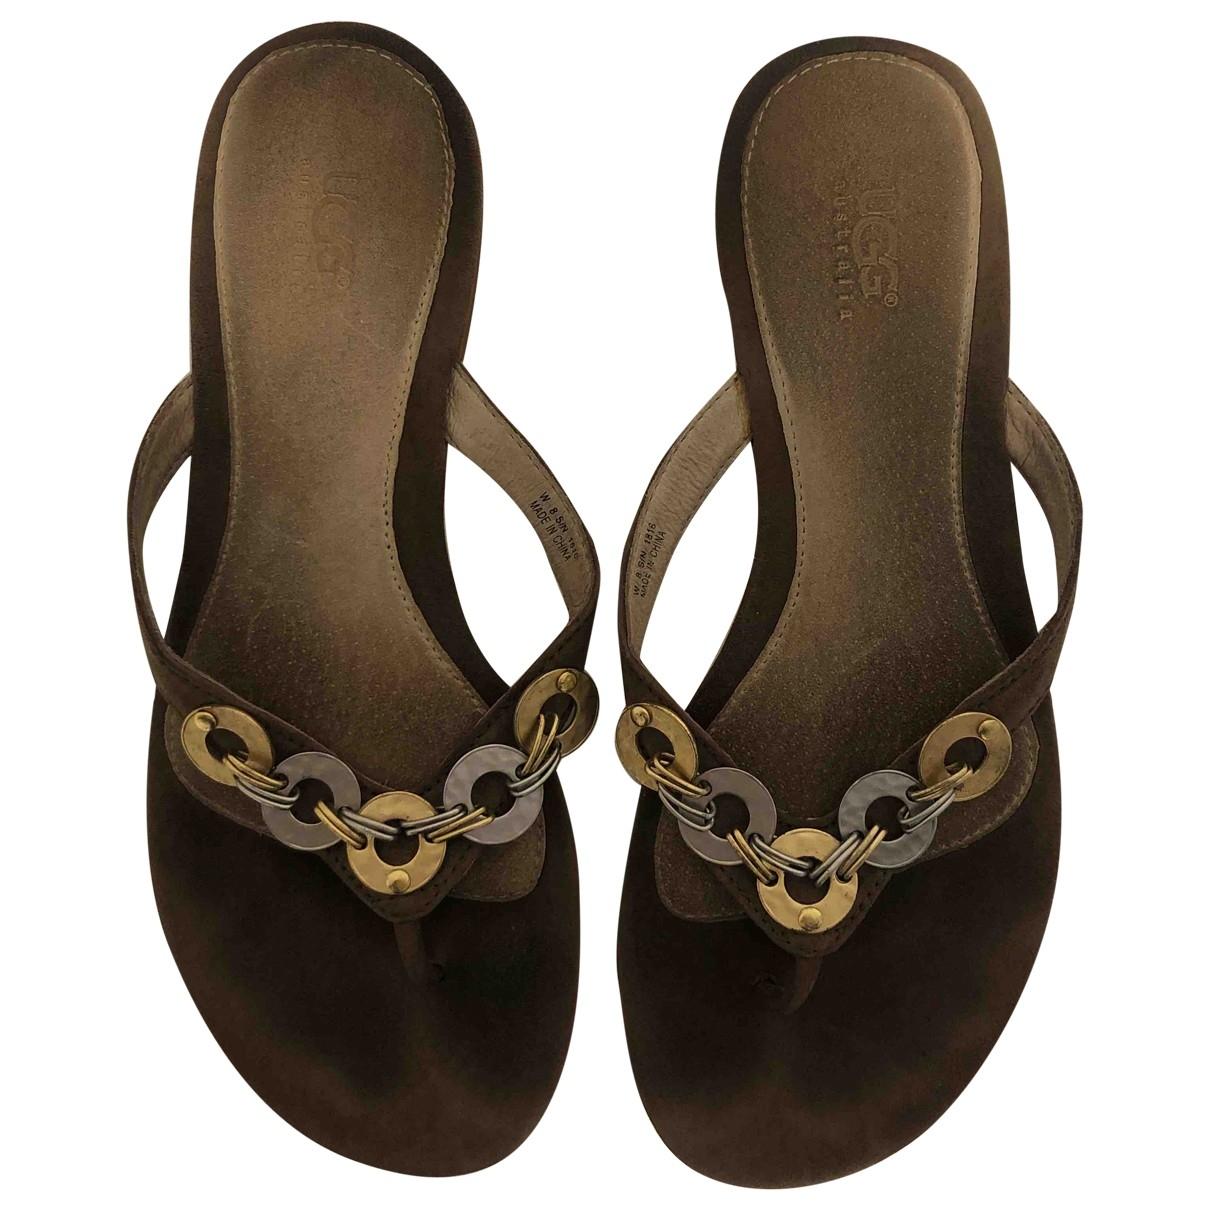 Ugg \N Brown Suede Sandals for Women 38 EU